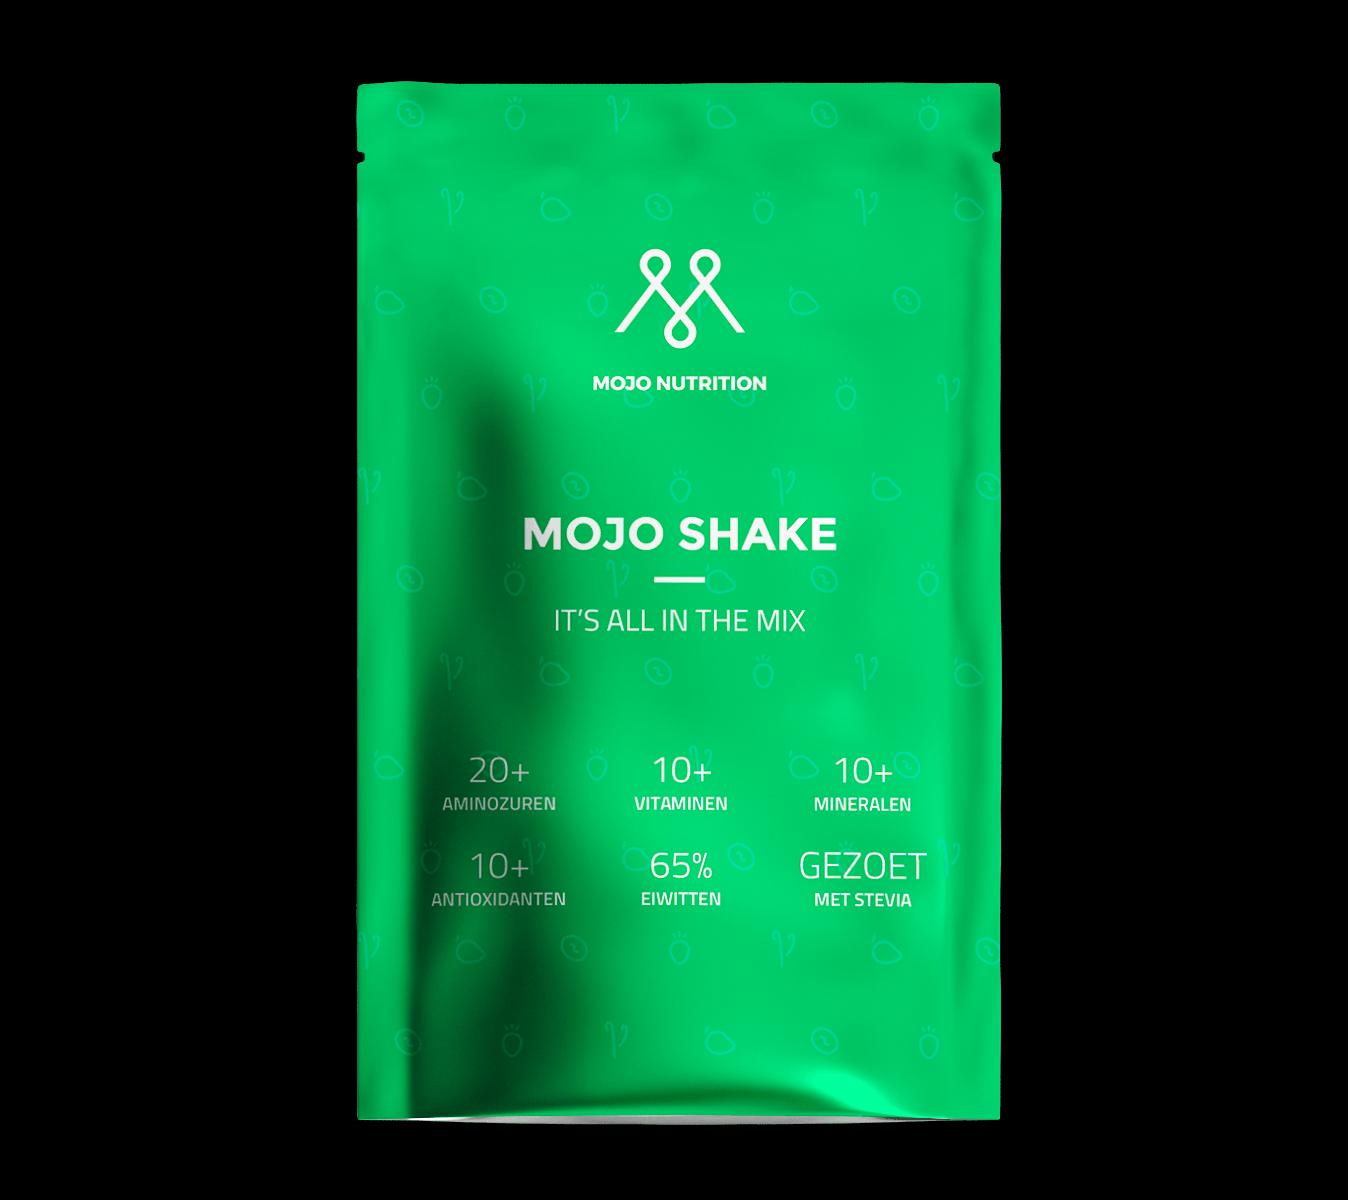 Mojo Shake reviews